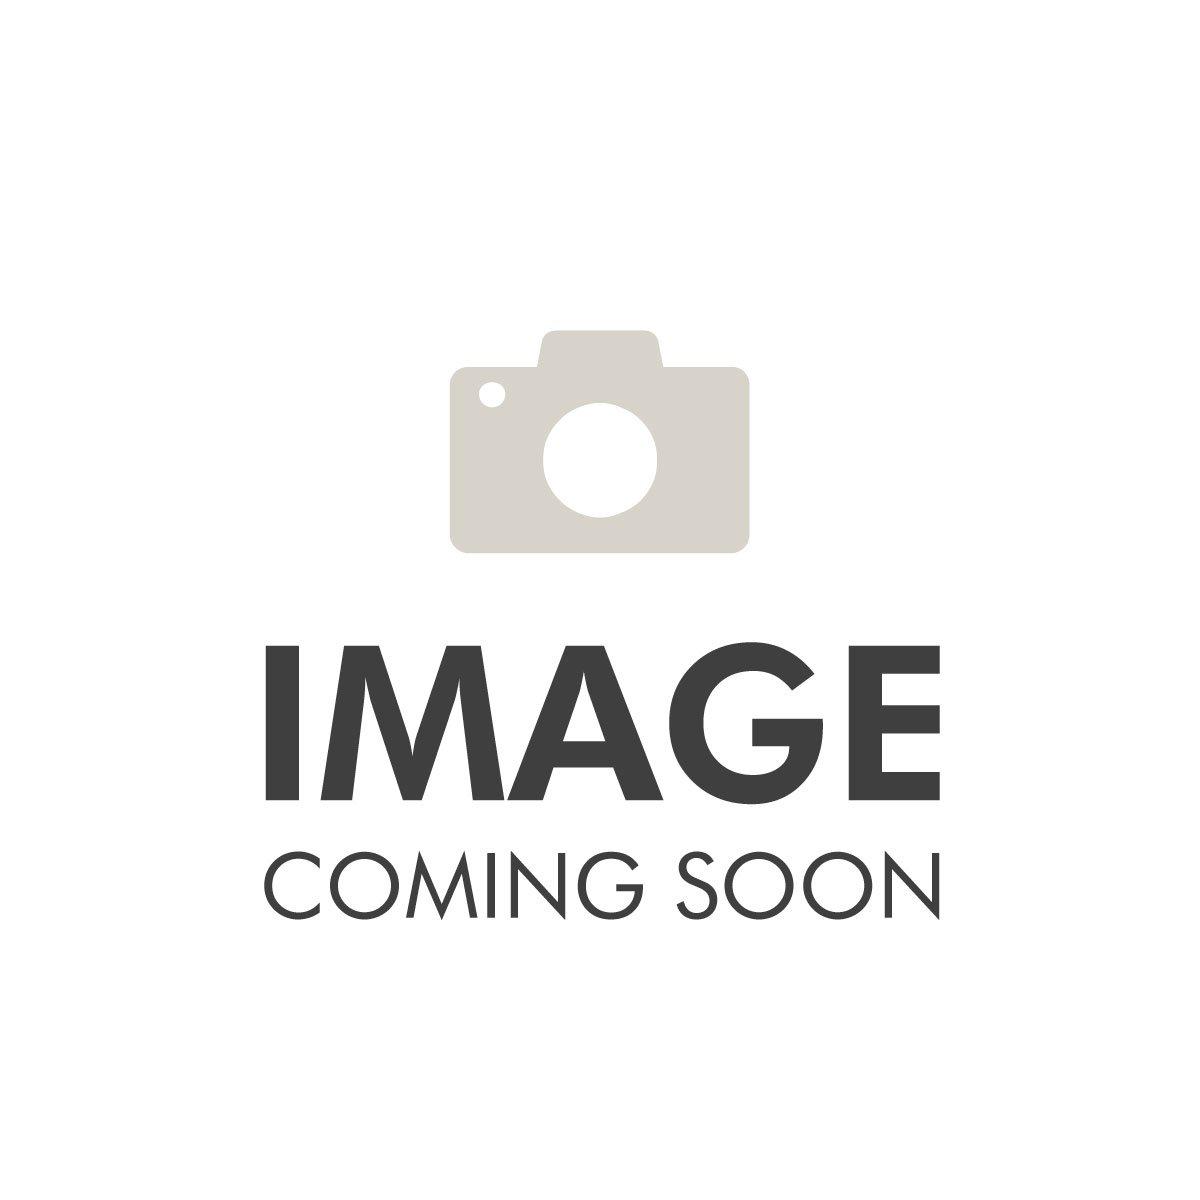 Clarins Precious Lip Collection Makeup Gift Set  5 Pieces